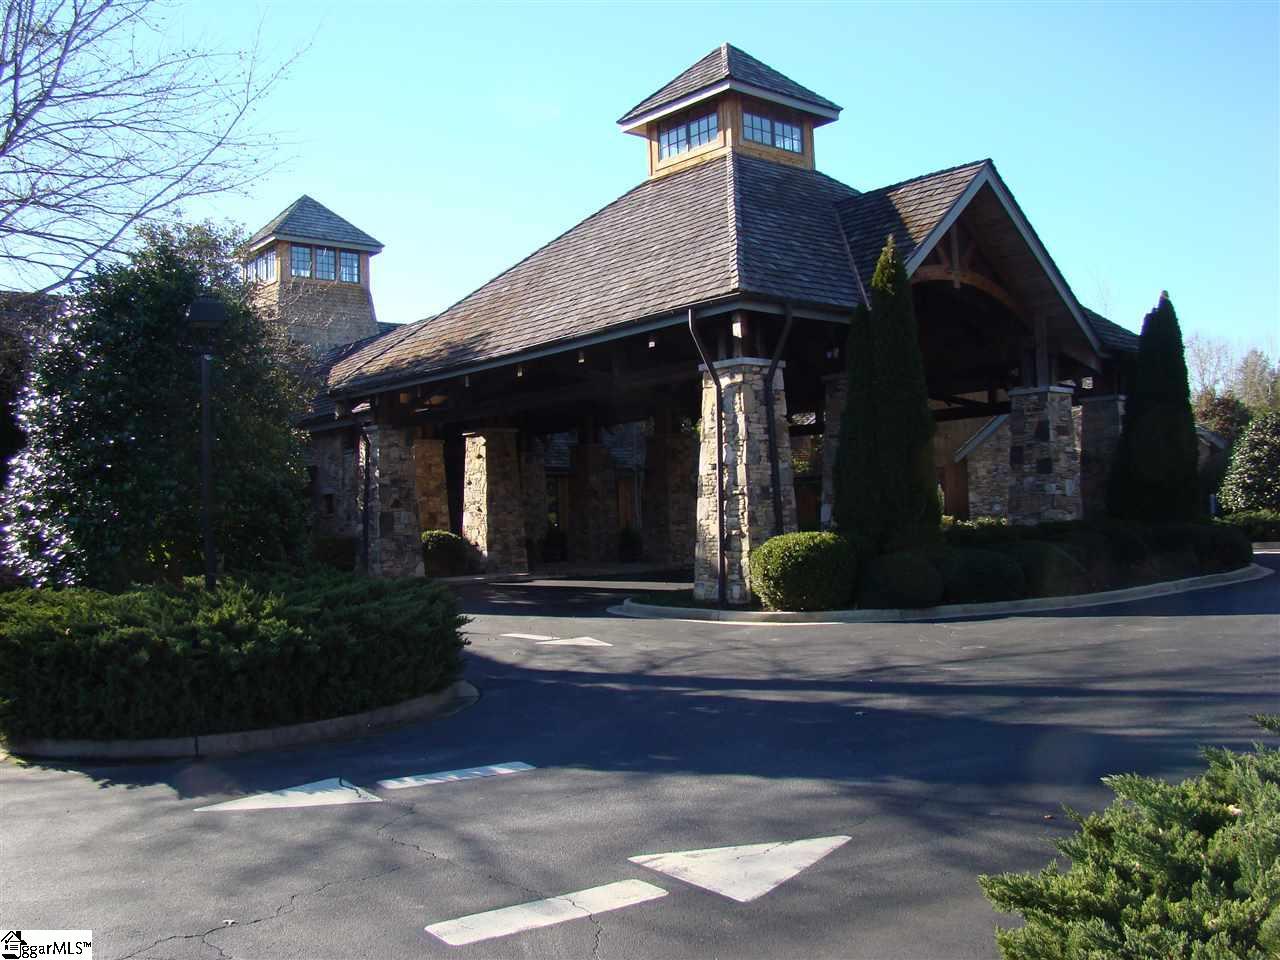 130 Club Cove Sunset, SC 29685